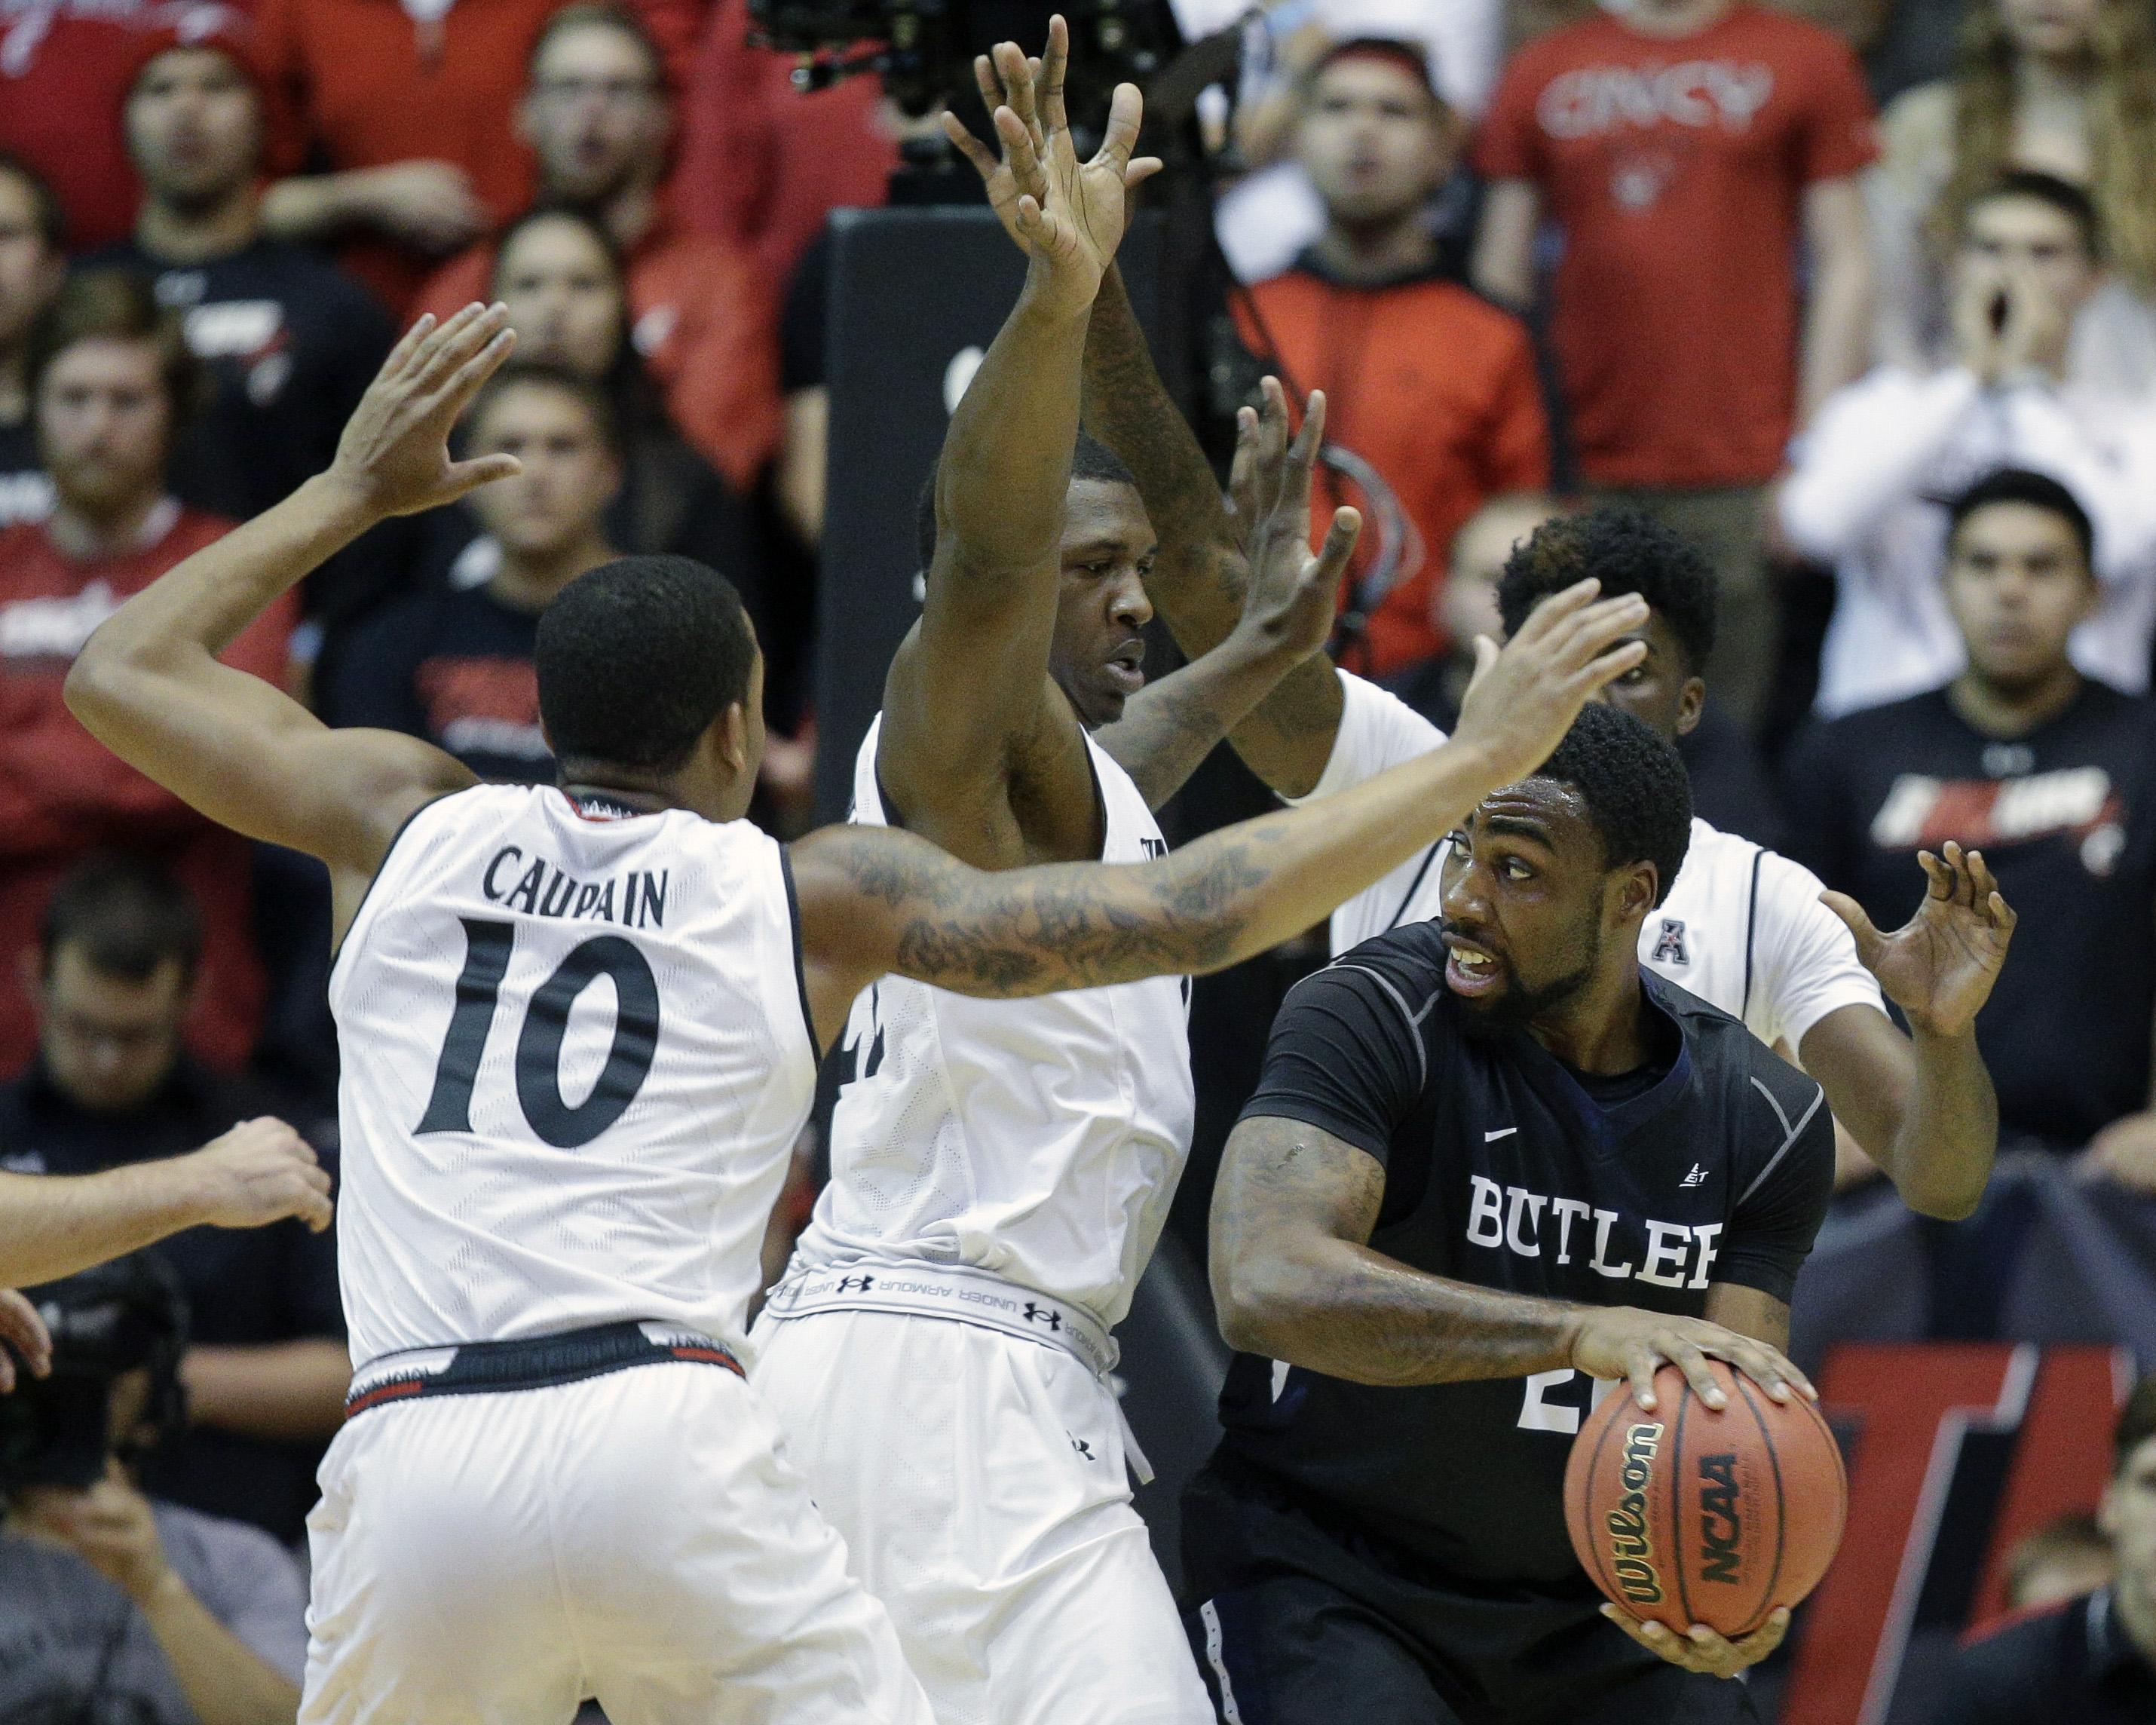 Butler's Roosevelt Jones (21) looks to pass around Cincinnati's Coreontae DeBerry, center, and Troy Caupain (10) in the first half of an NCAA college basketball game, Wednesday, Dec. 2, 2015, in Cincinnati. (AP Photo/John Minchillo)